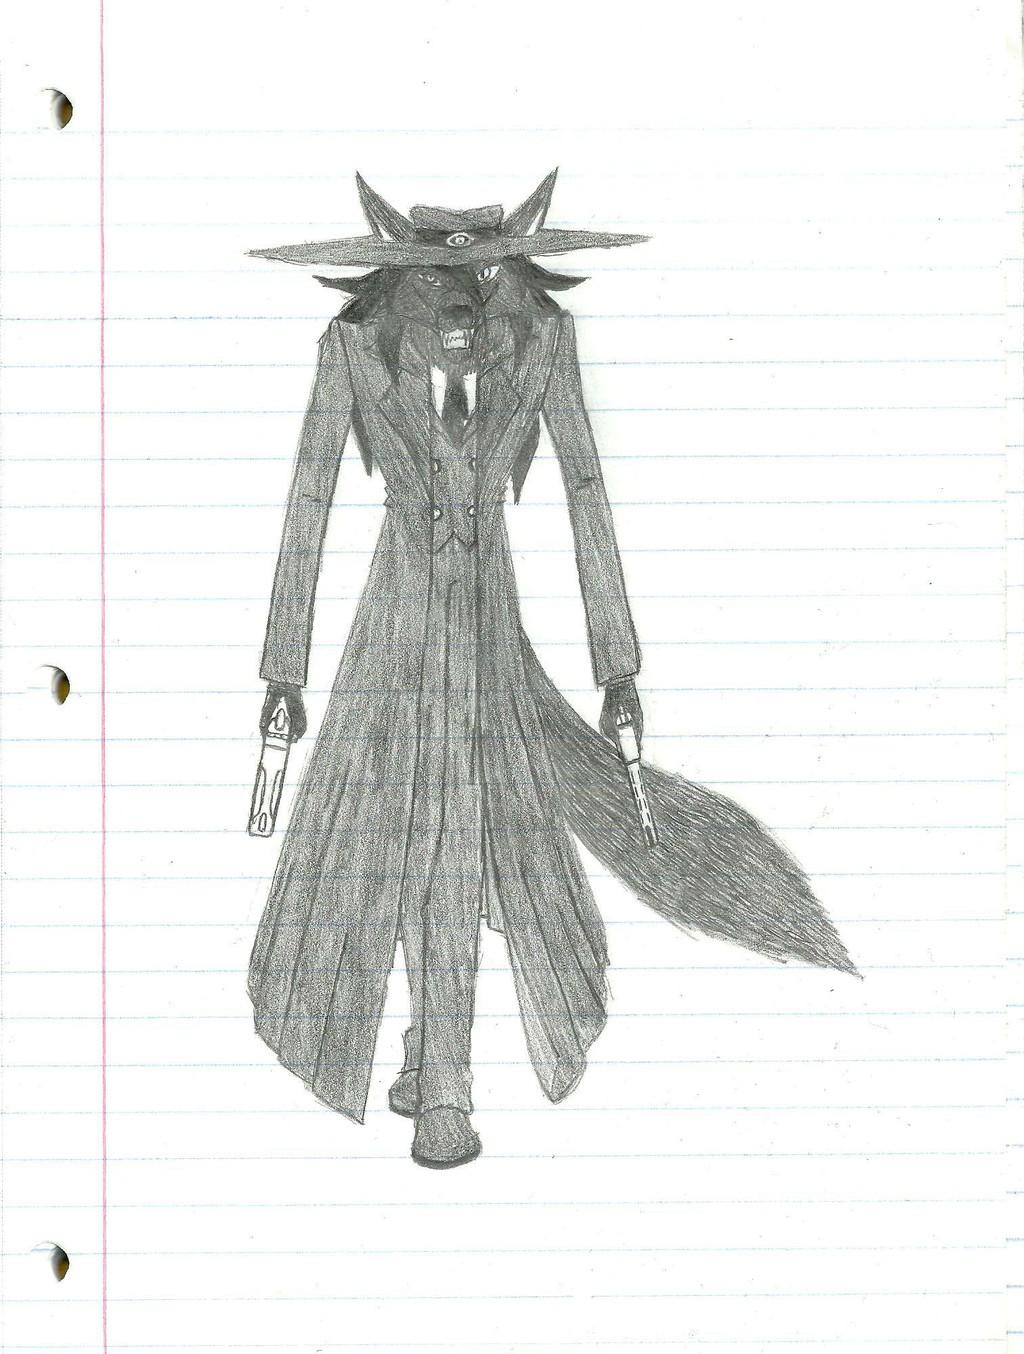 Most recent character: Vladoff McCalister